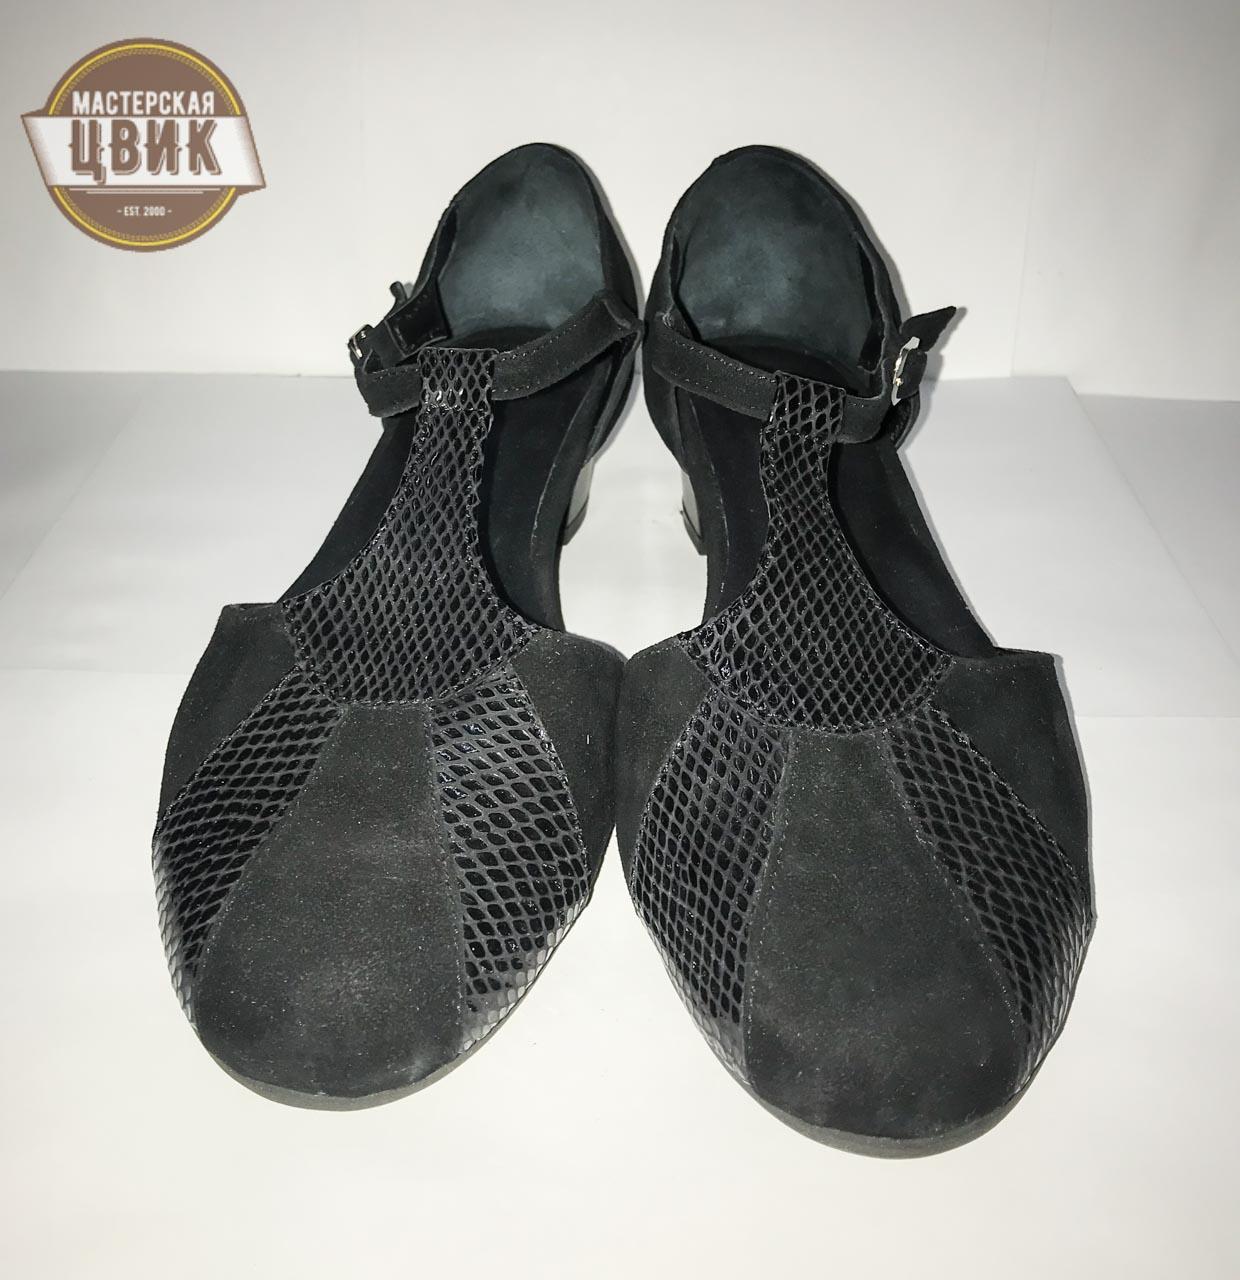 individualnyj-poshiv-obuvi-minsk-16 Индивидуальный пошив обуви Минск-16